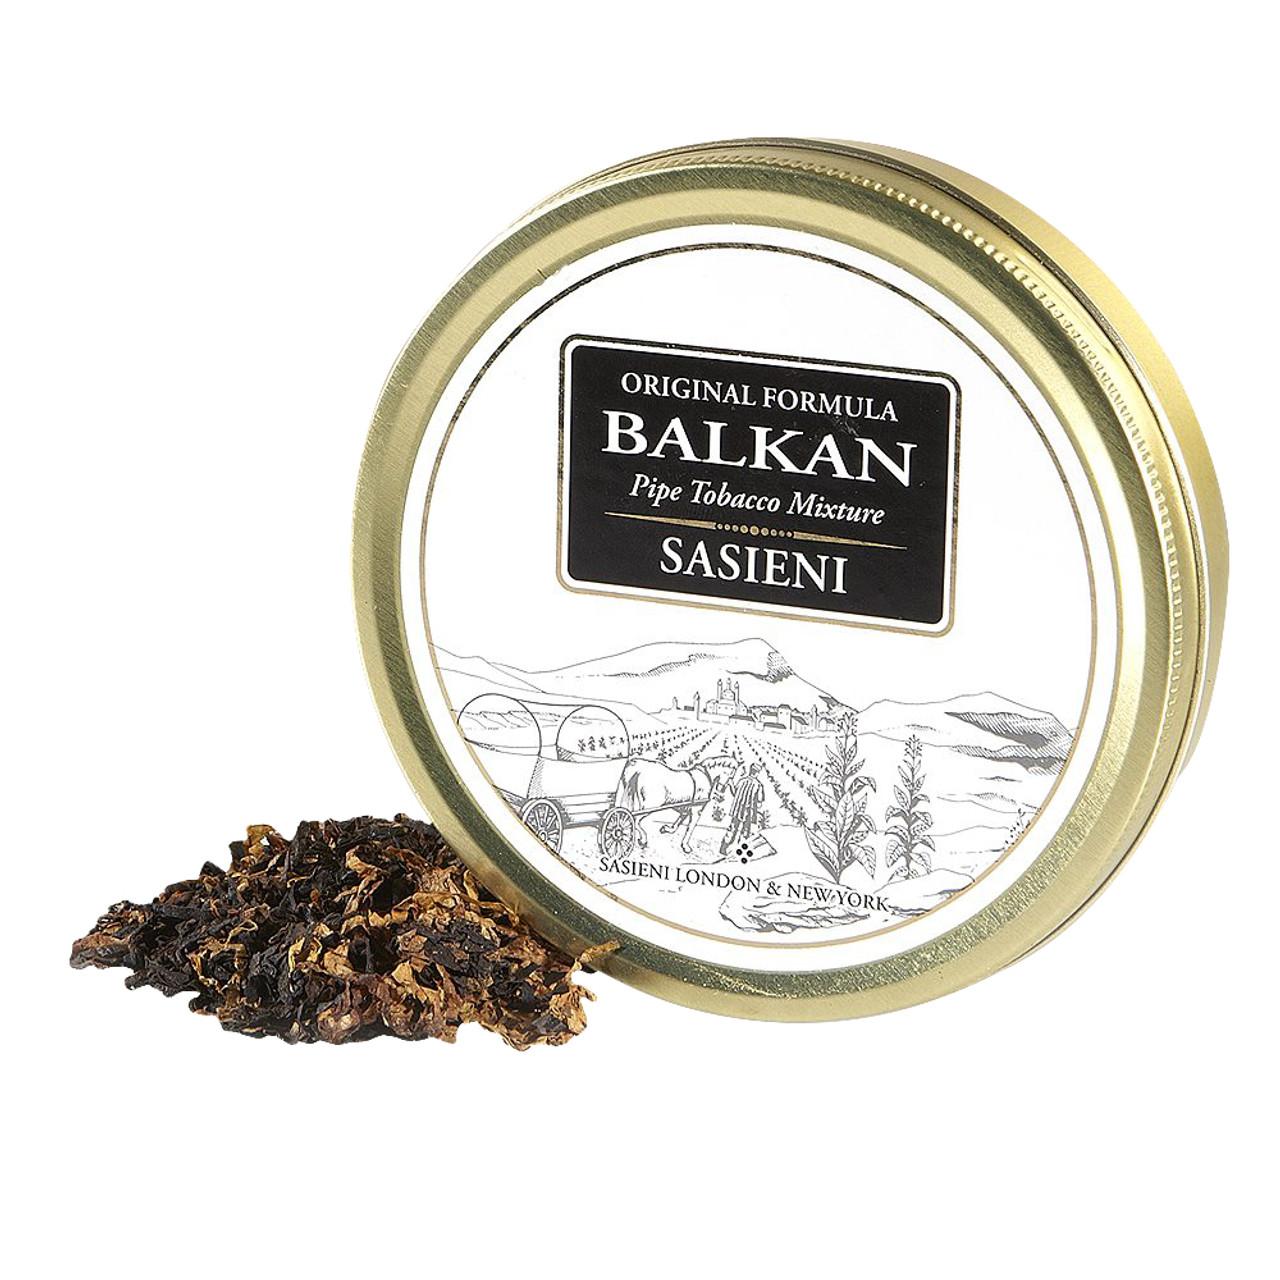 Balkan Sasieni Pipe Tobacco   1.75 OZ TIN